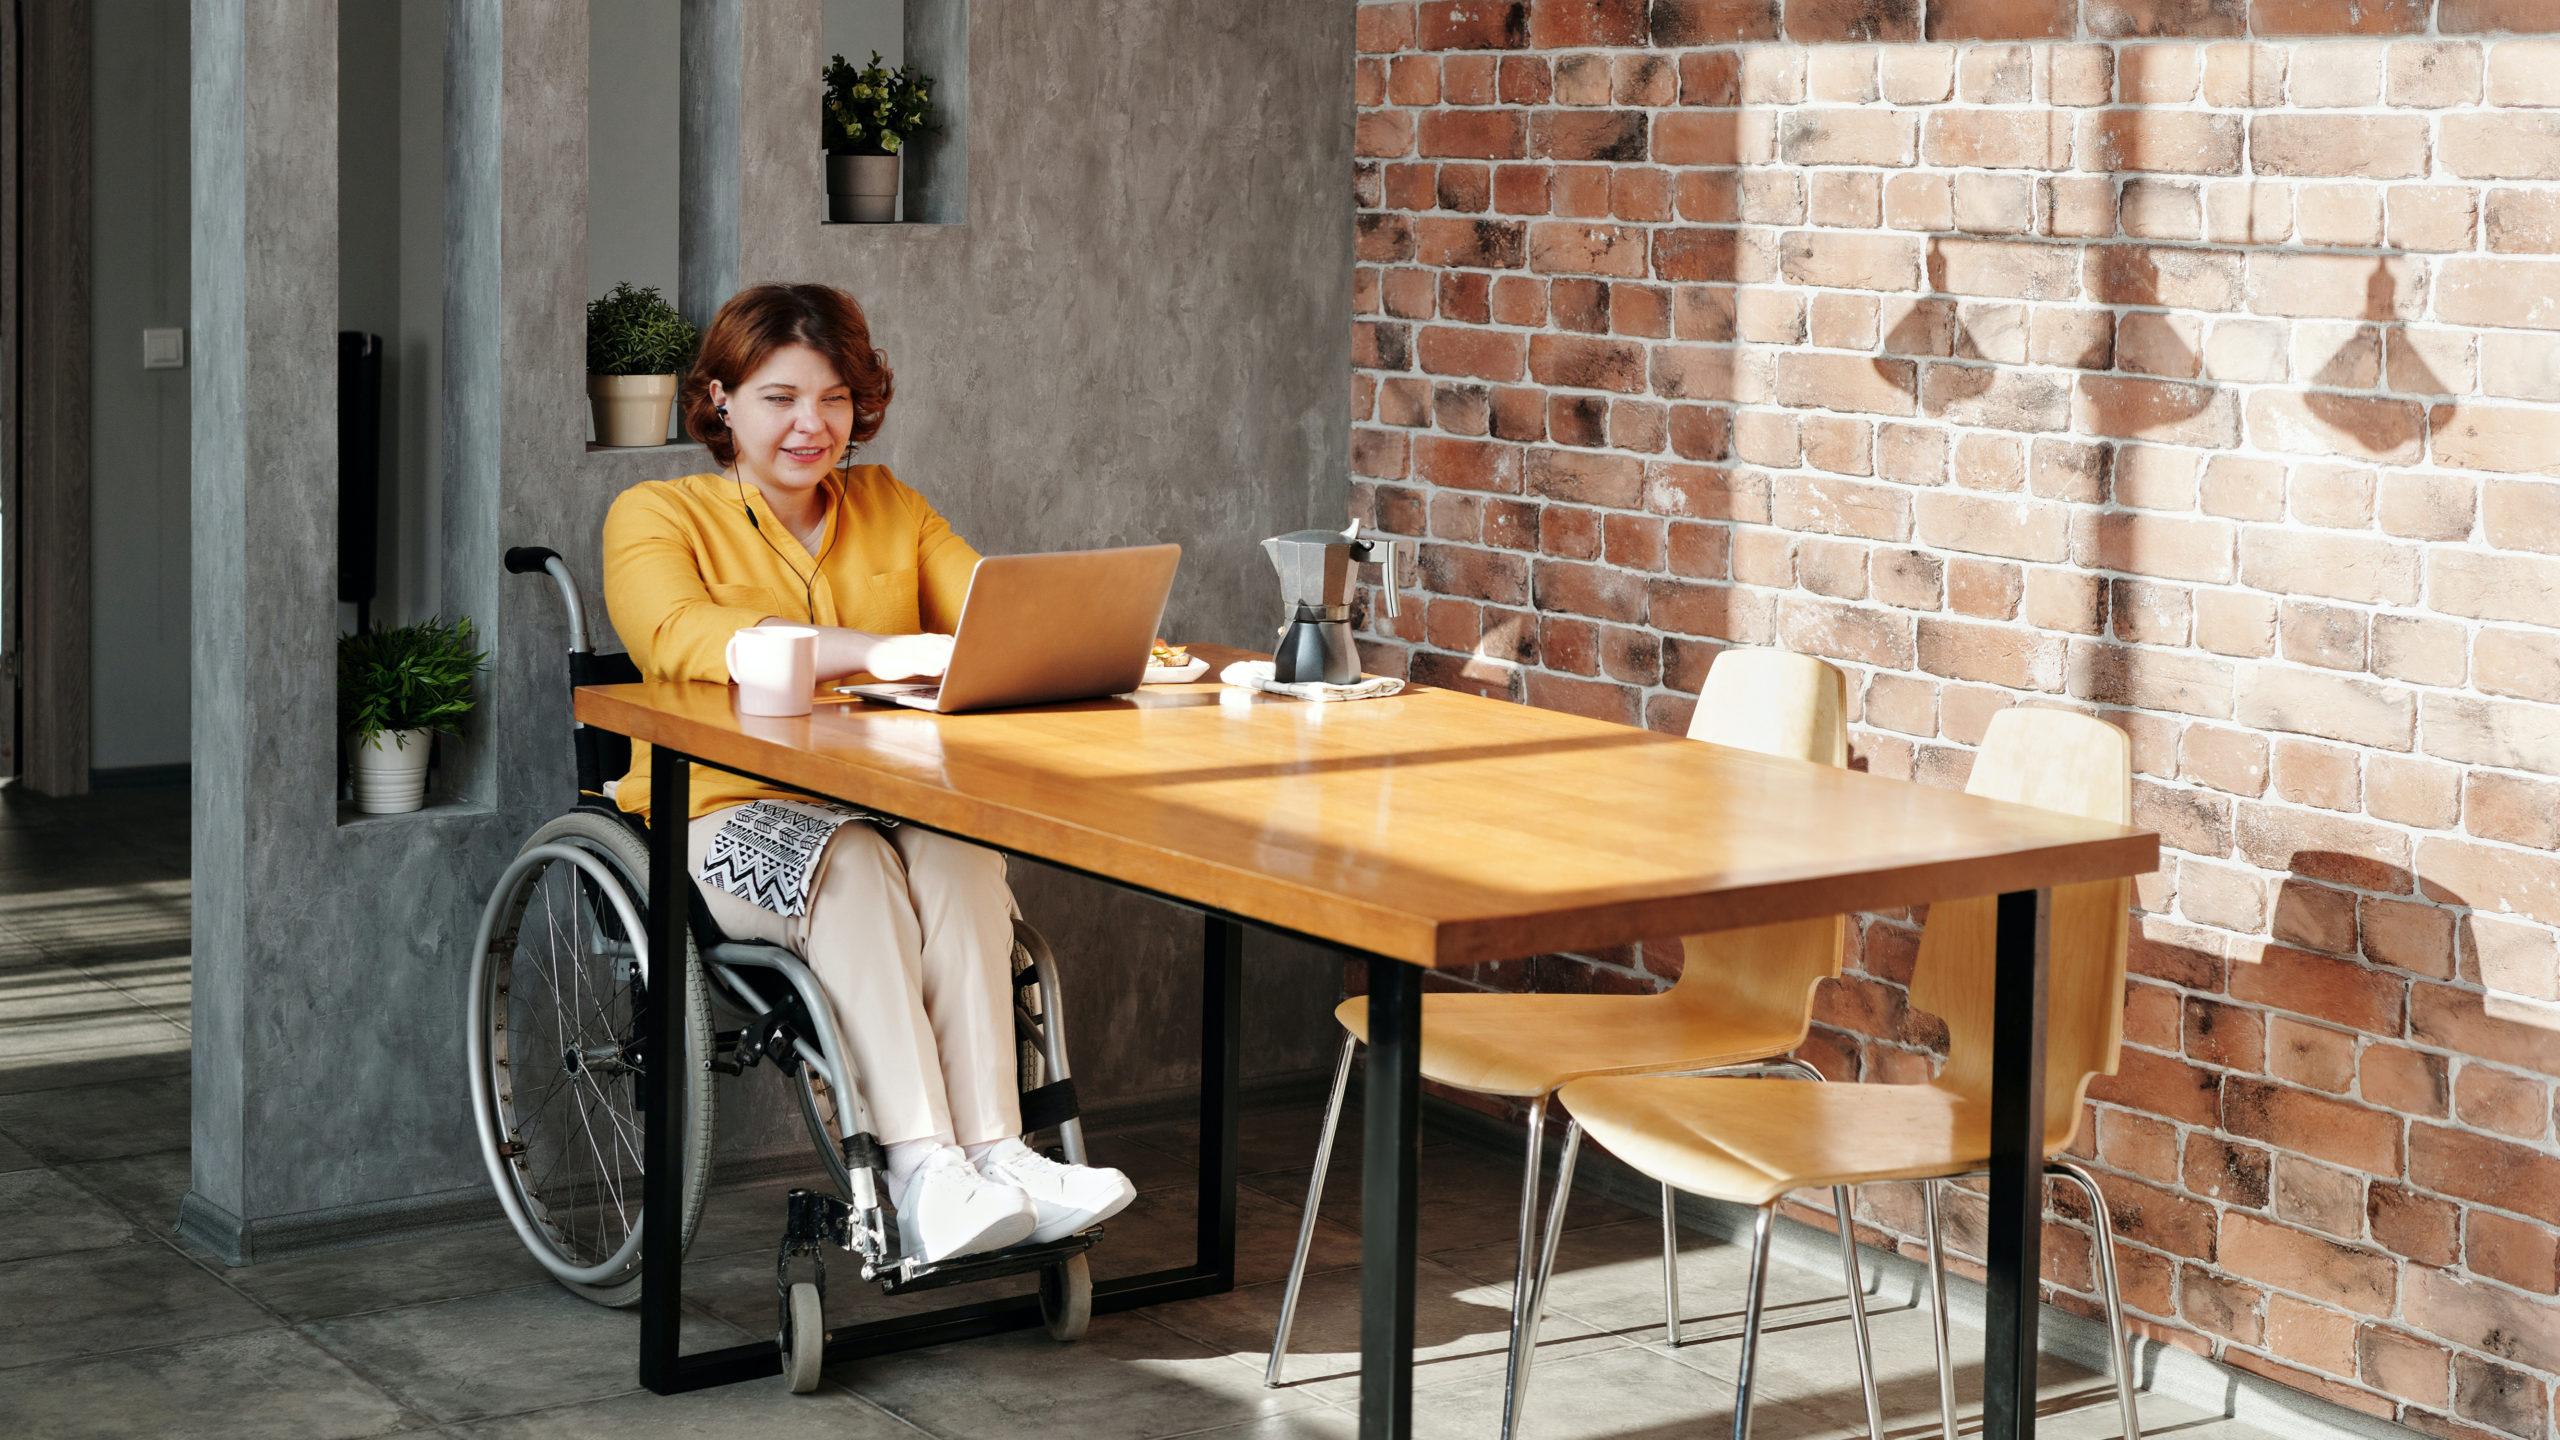 La economía digital post Covid 19 debe ser inclusiva: OIT